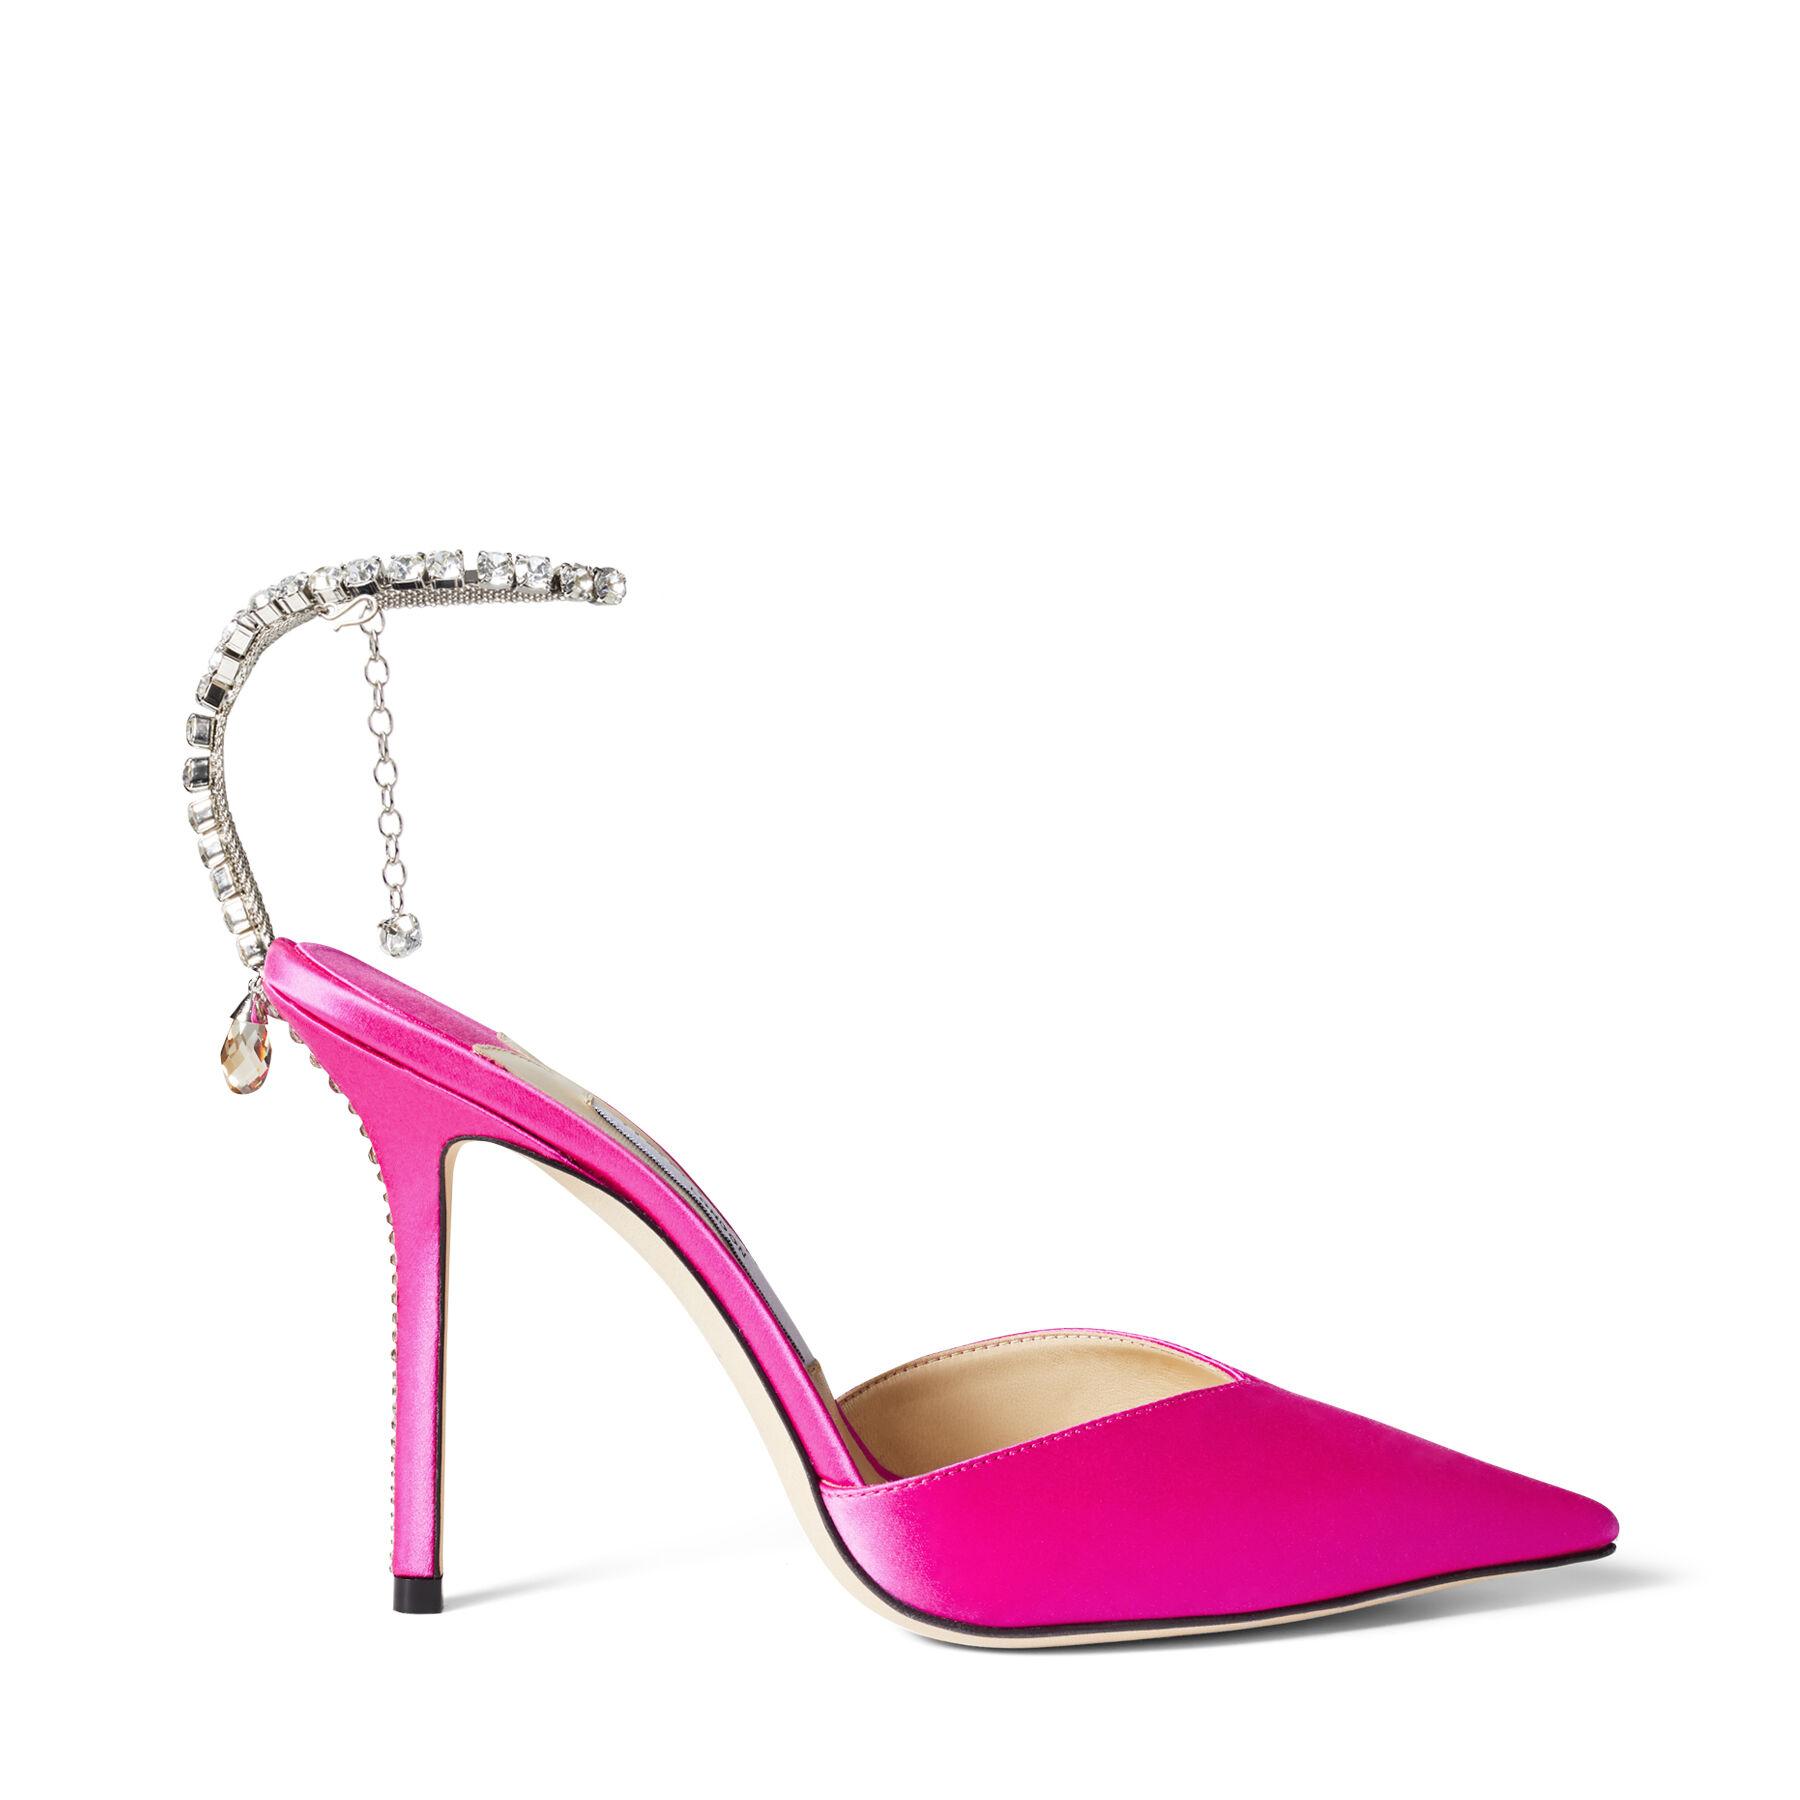 SAEDA 100 by Jimmy Choo, available on jimmychoo.com for EUR850 Hailey Baldwin Shoes Exact Product